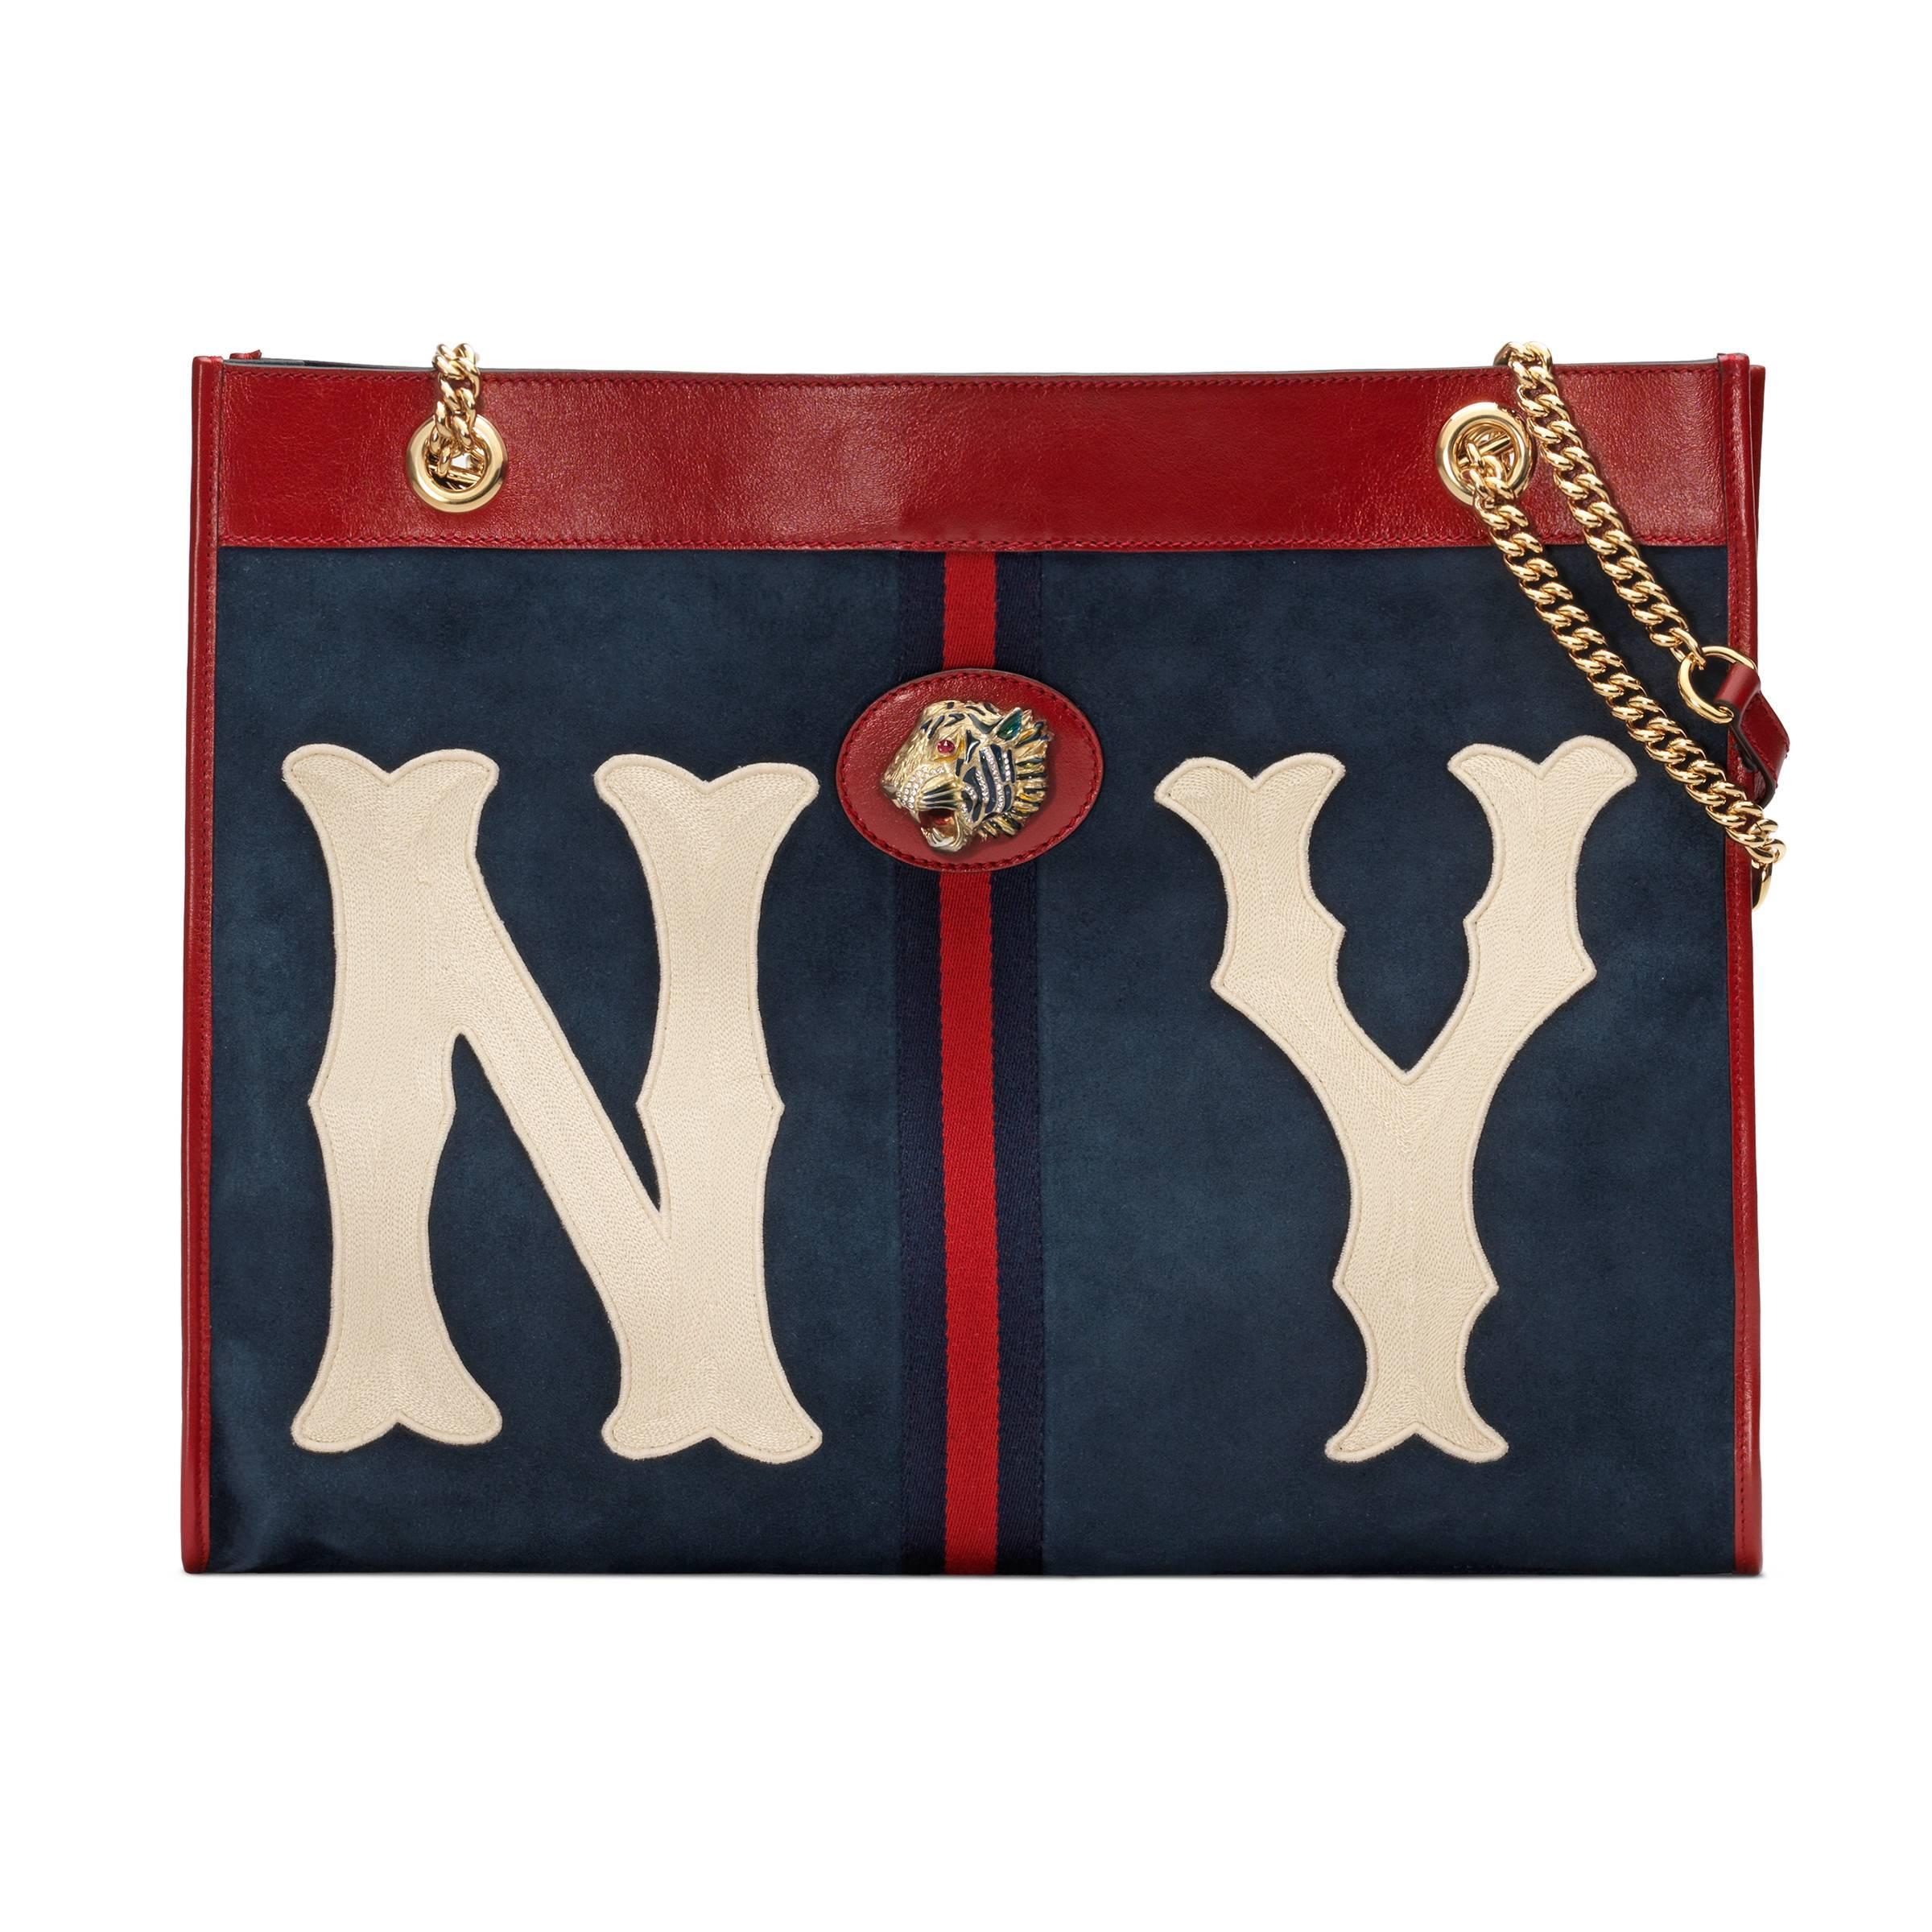 1e74a95442 Damen Großer Rajah Shopper mit NY YankeesTM-Patch in blau